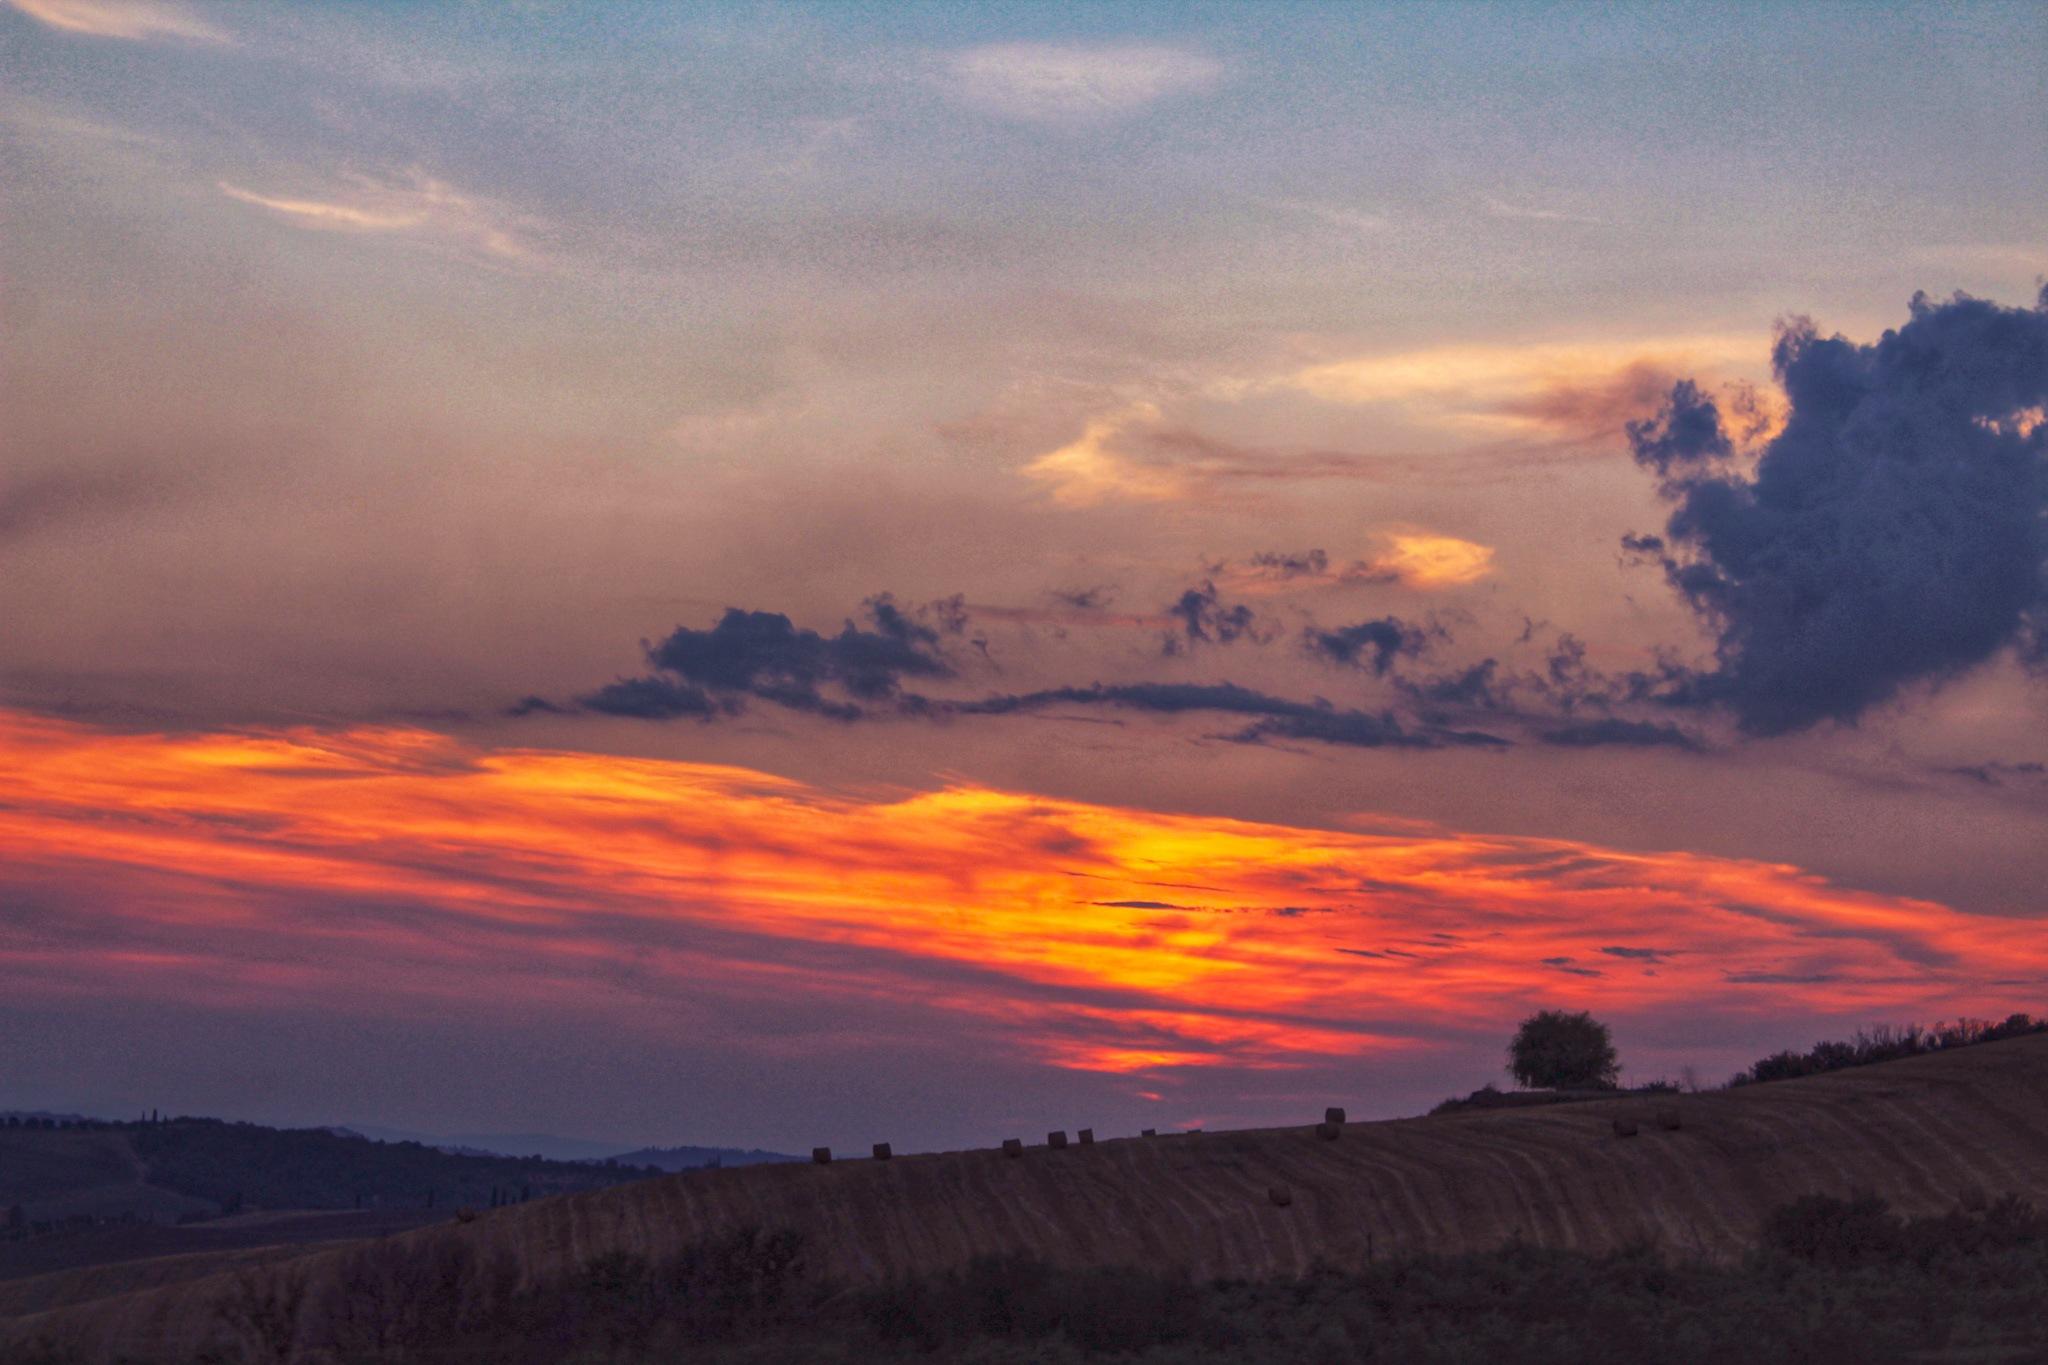 tramonti toscani by Gabriella Horvat